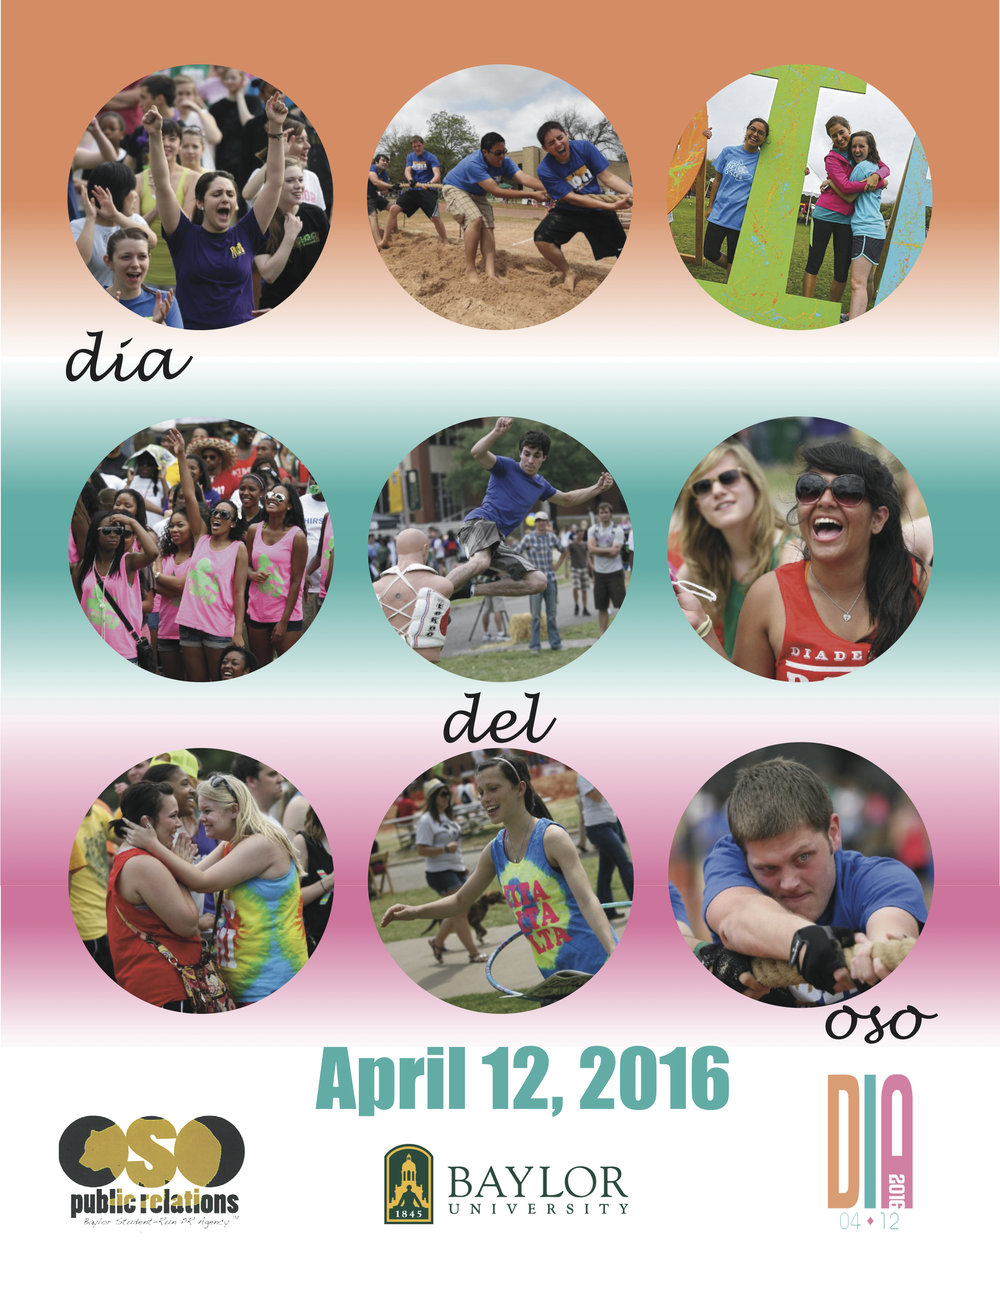 diadeloso 2016 flyer.jpg